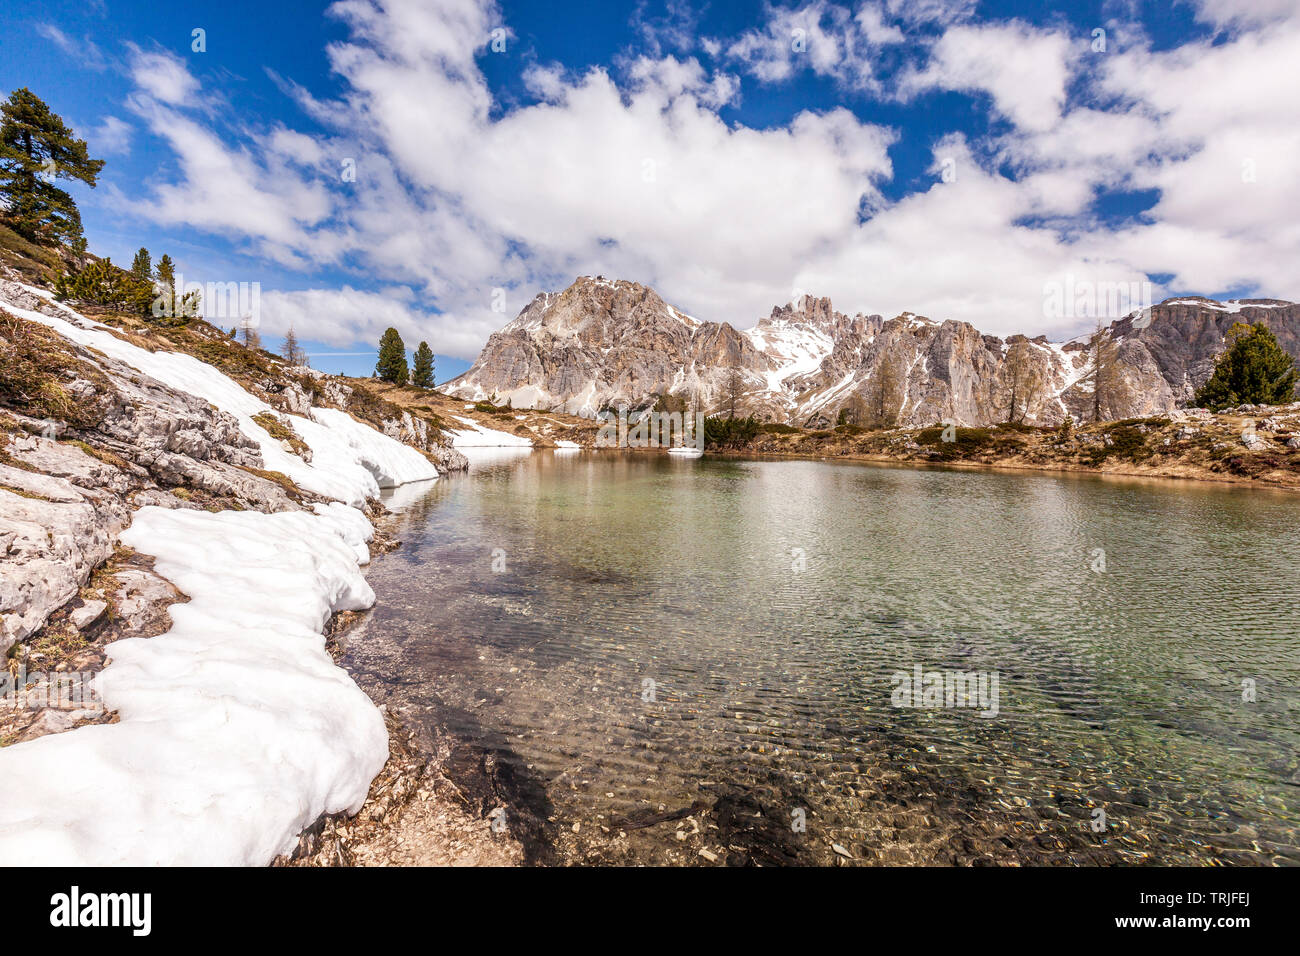 Lagazuoi and Tofane group mirrored in Limides Lake, Dolomites, Cortina d'Ampezzo, Belluno province, Veneto, Italy - Stock Image